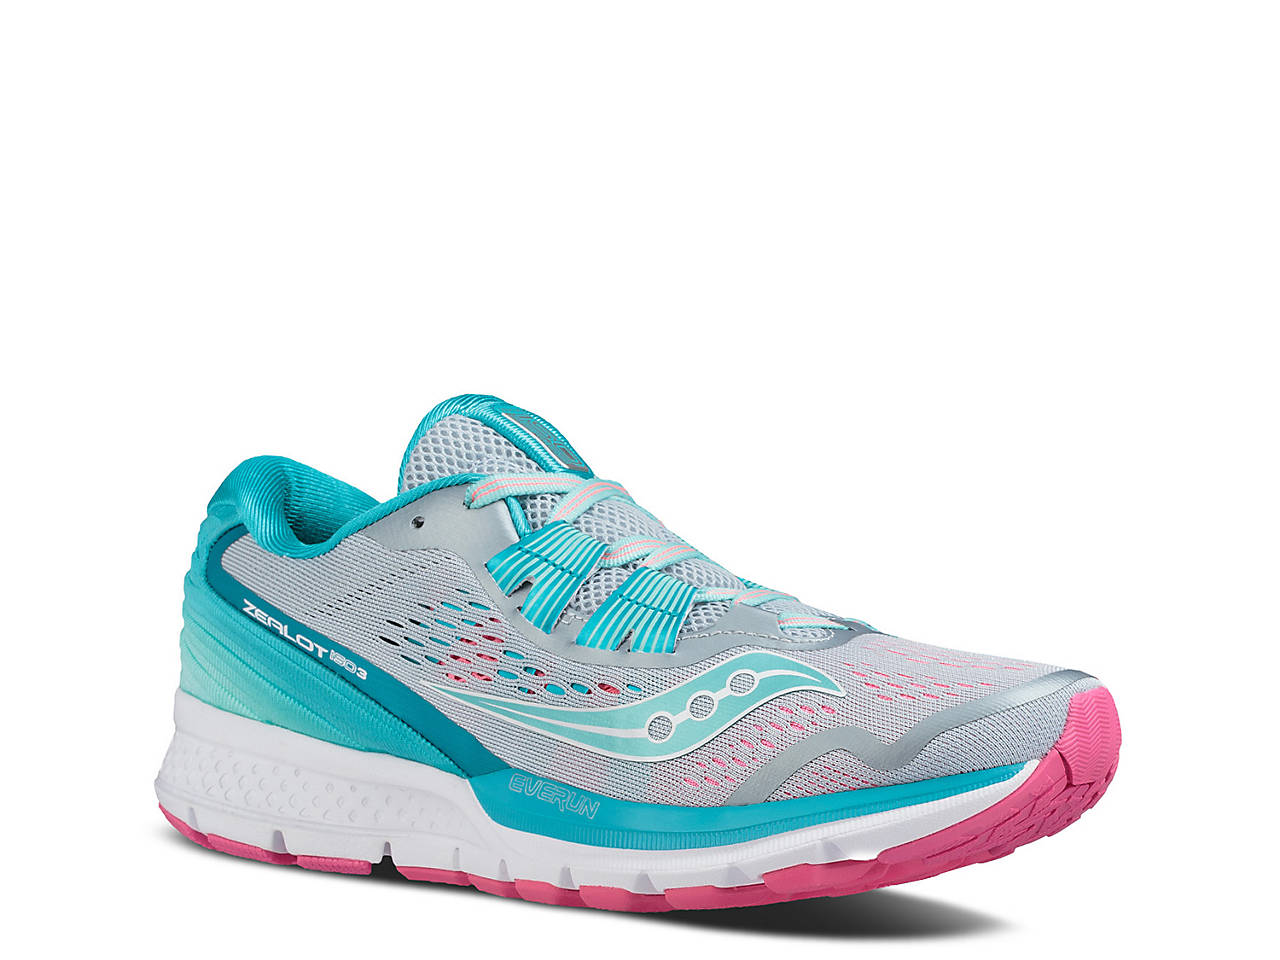 78e46446 Zealot ISO 3 Performance Running Shoe - Women's